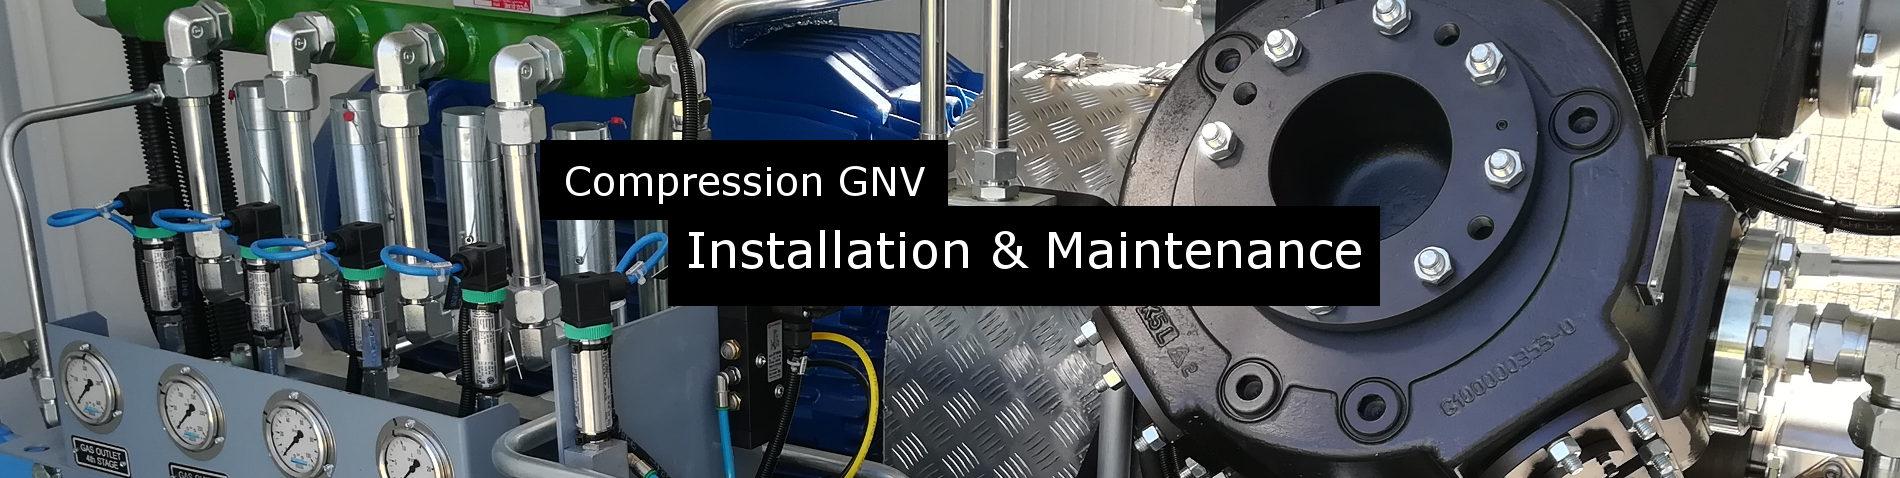 Stations Gaz GNV, installation et maintenance